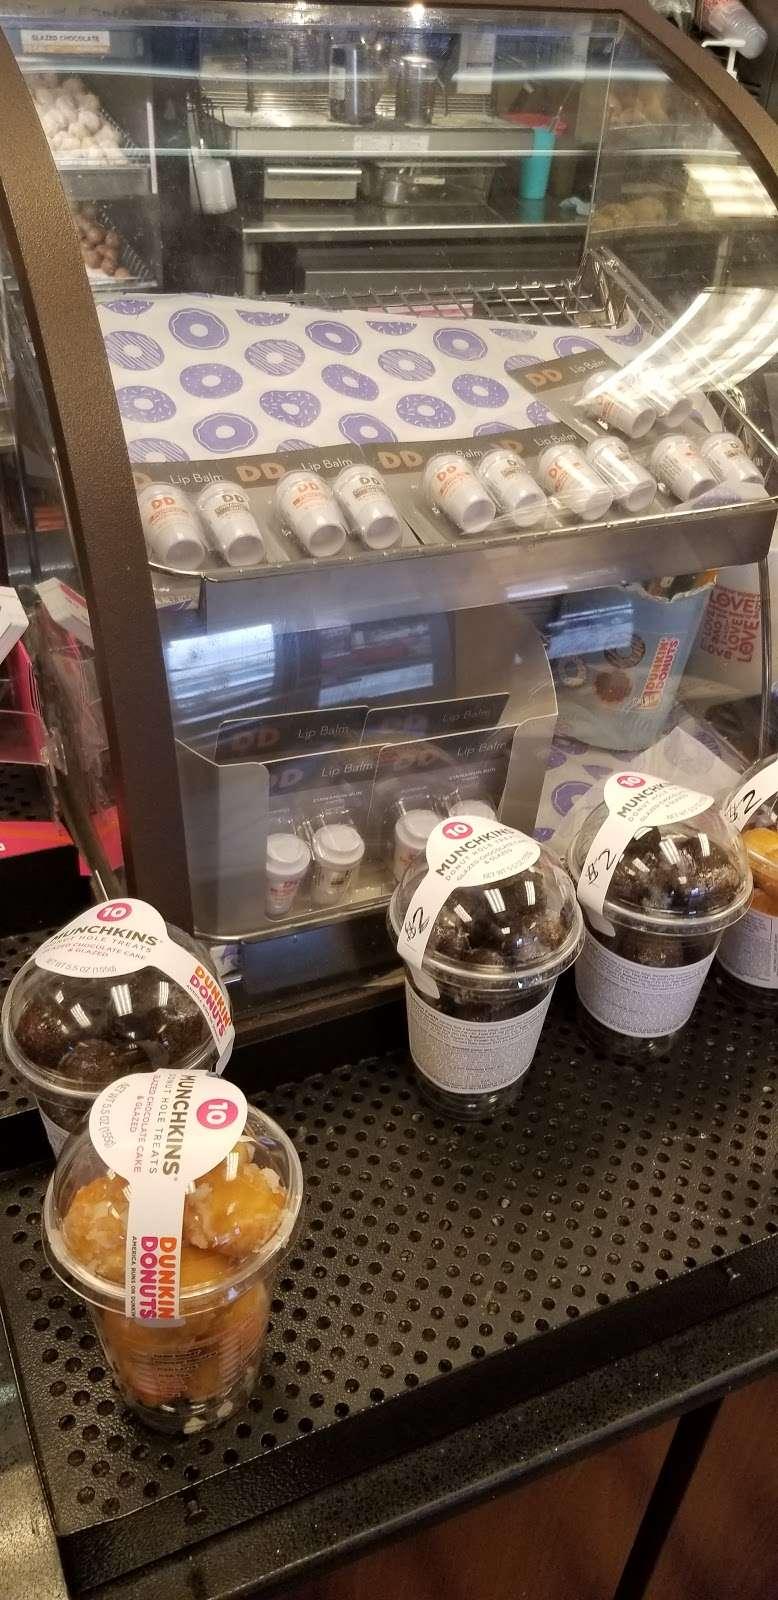 Dunkin Donuts - cafe    Photo 2 of 10   Address: 410 Lalor St, Trenton, NJ 08611, USA   Phone: (609) 394-0855